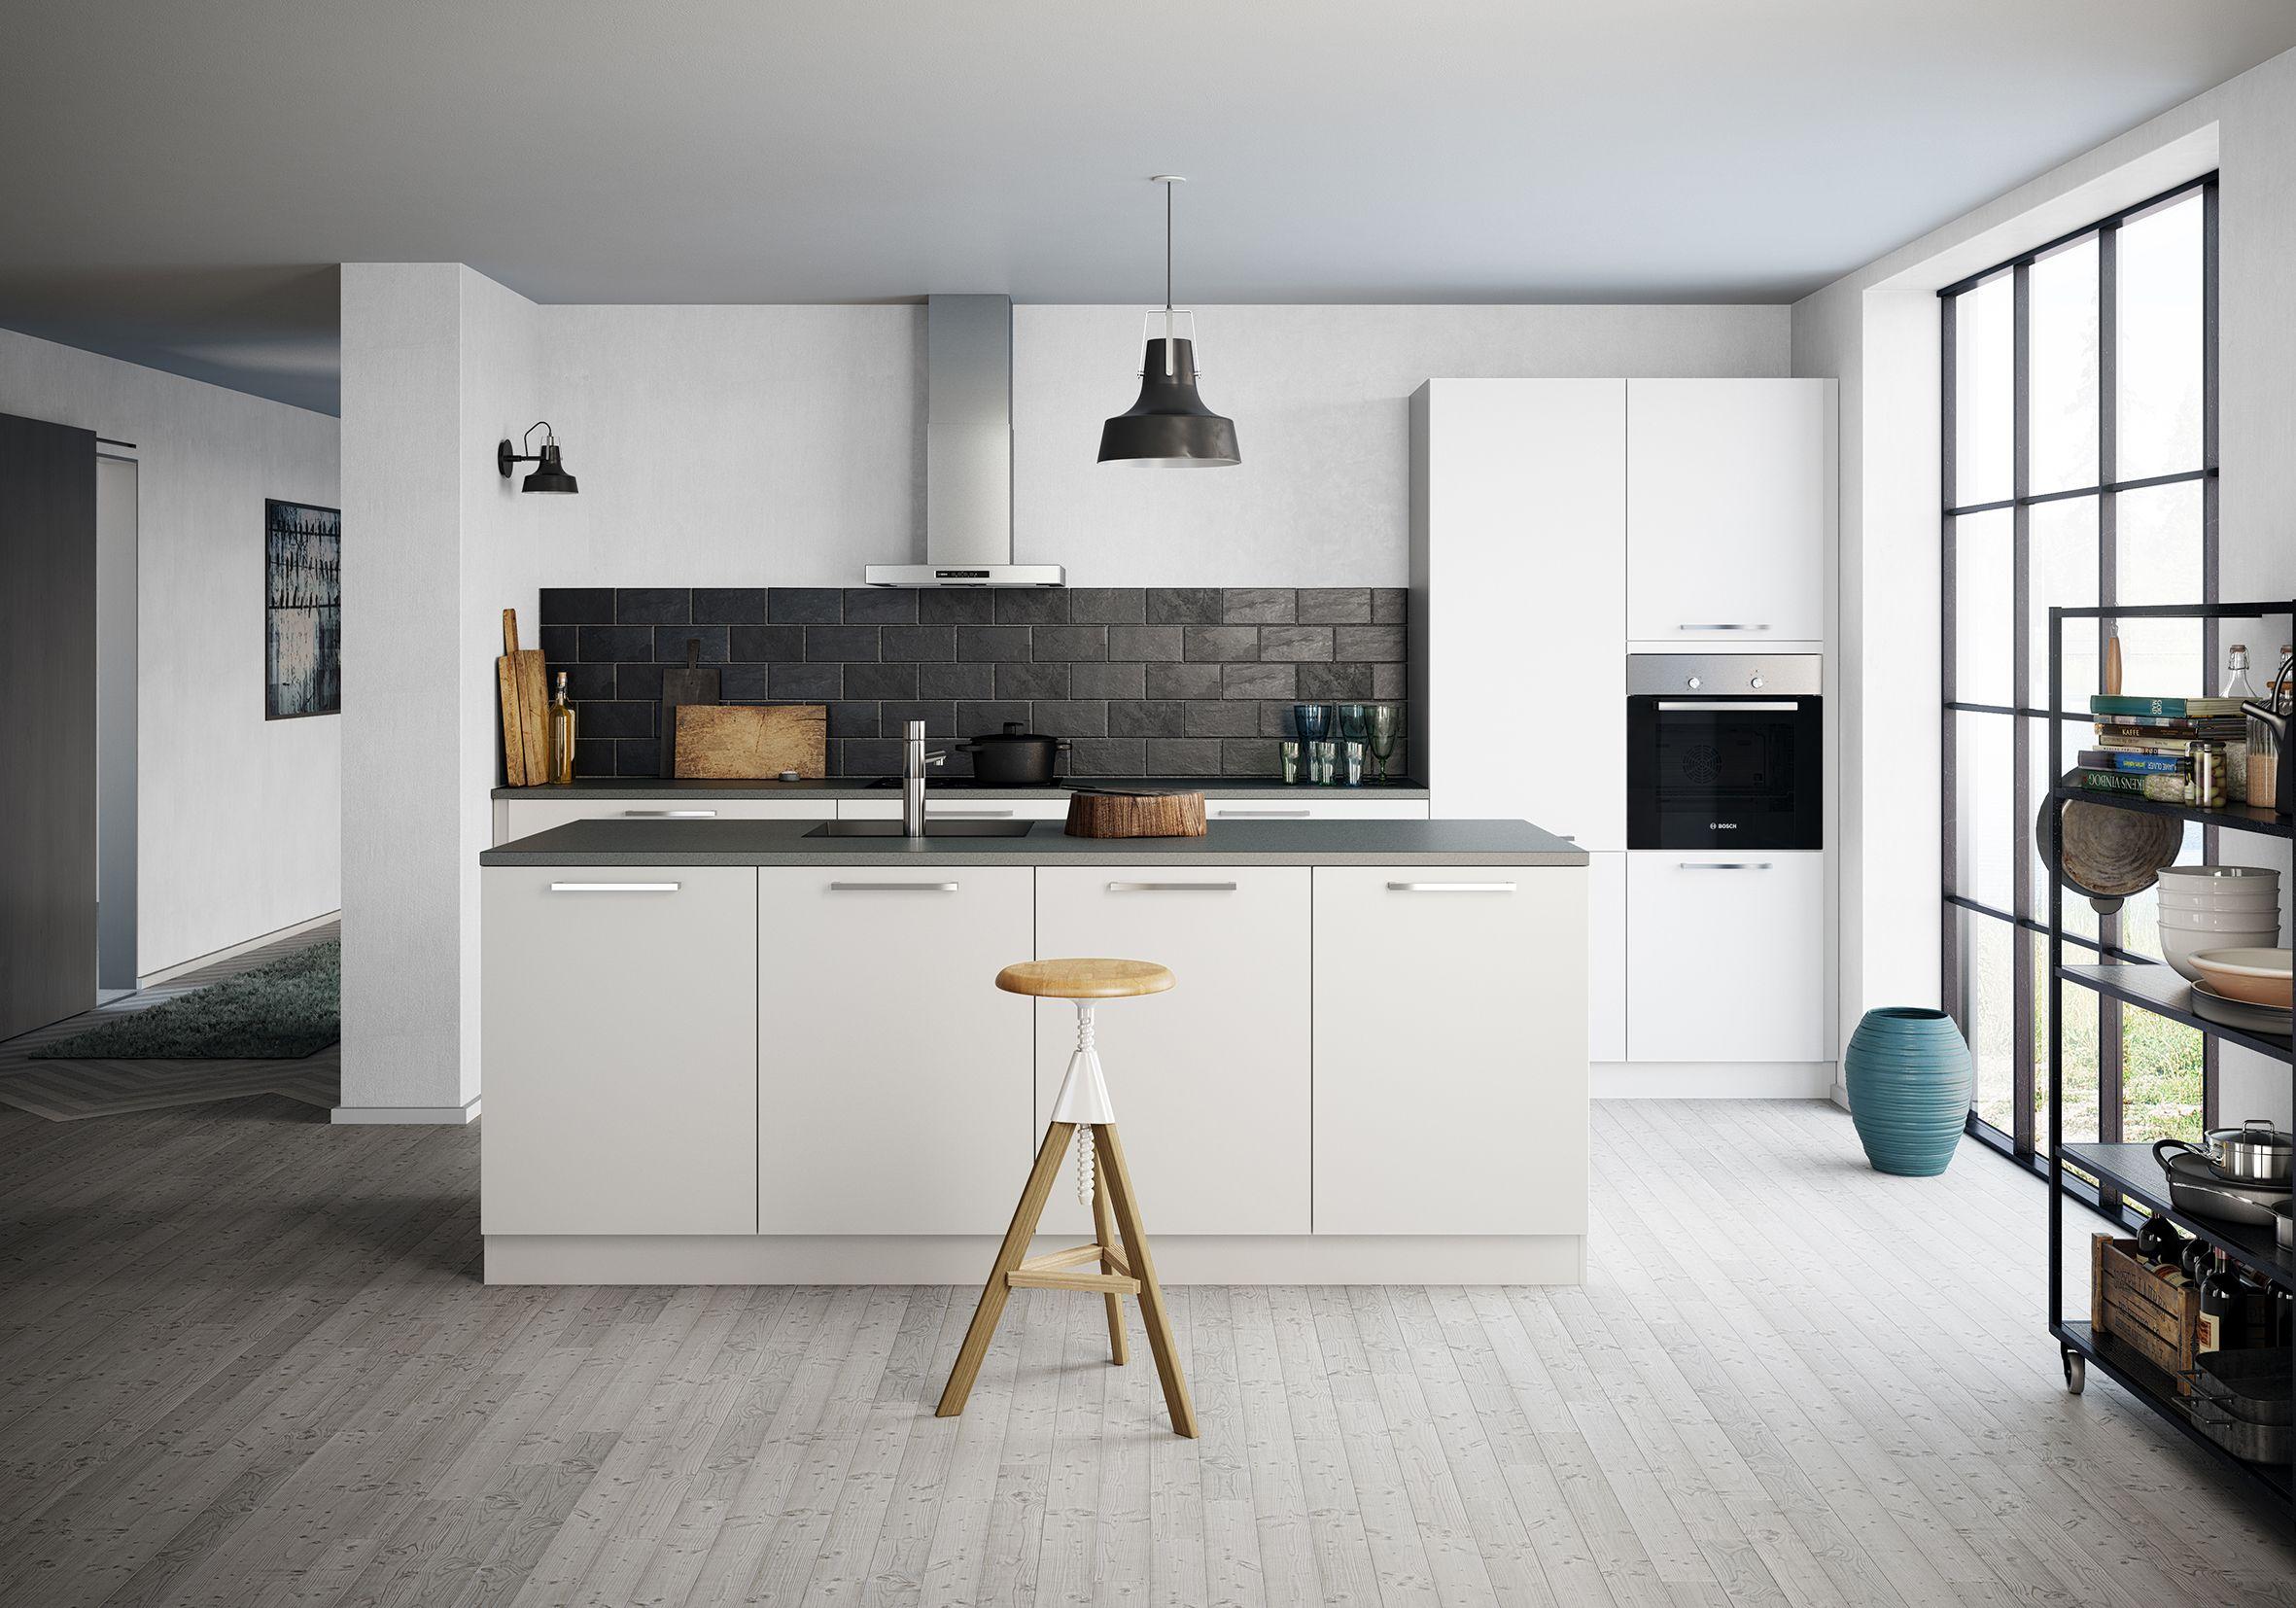 Milk by kvik kvik kitchen kitchen kitchen